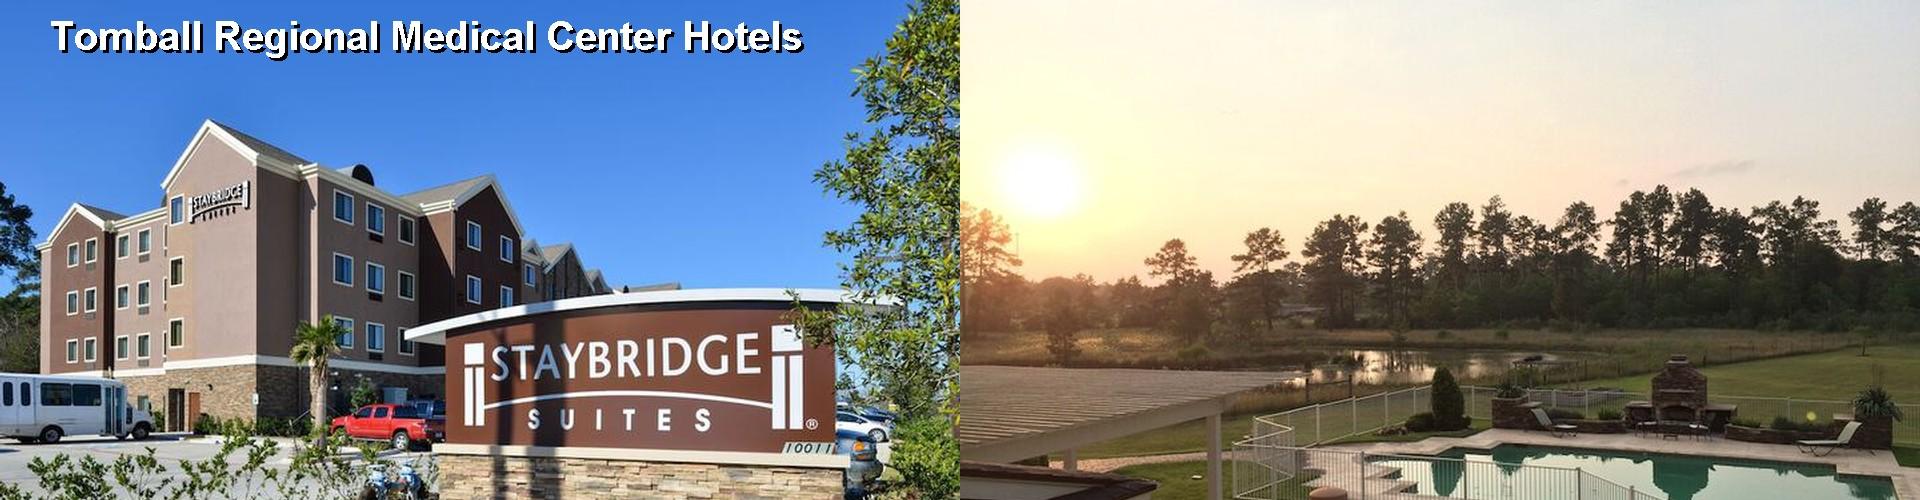 5 Best Hotels Near Tomball Regional Medical Center